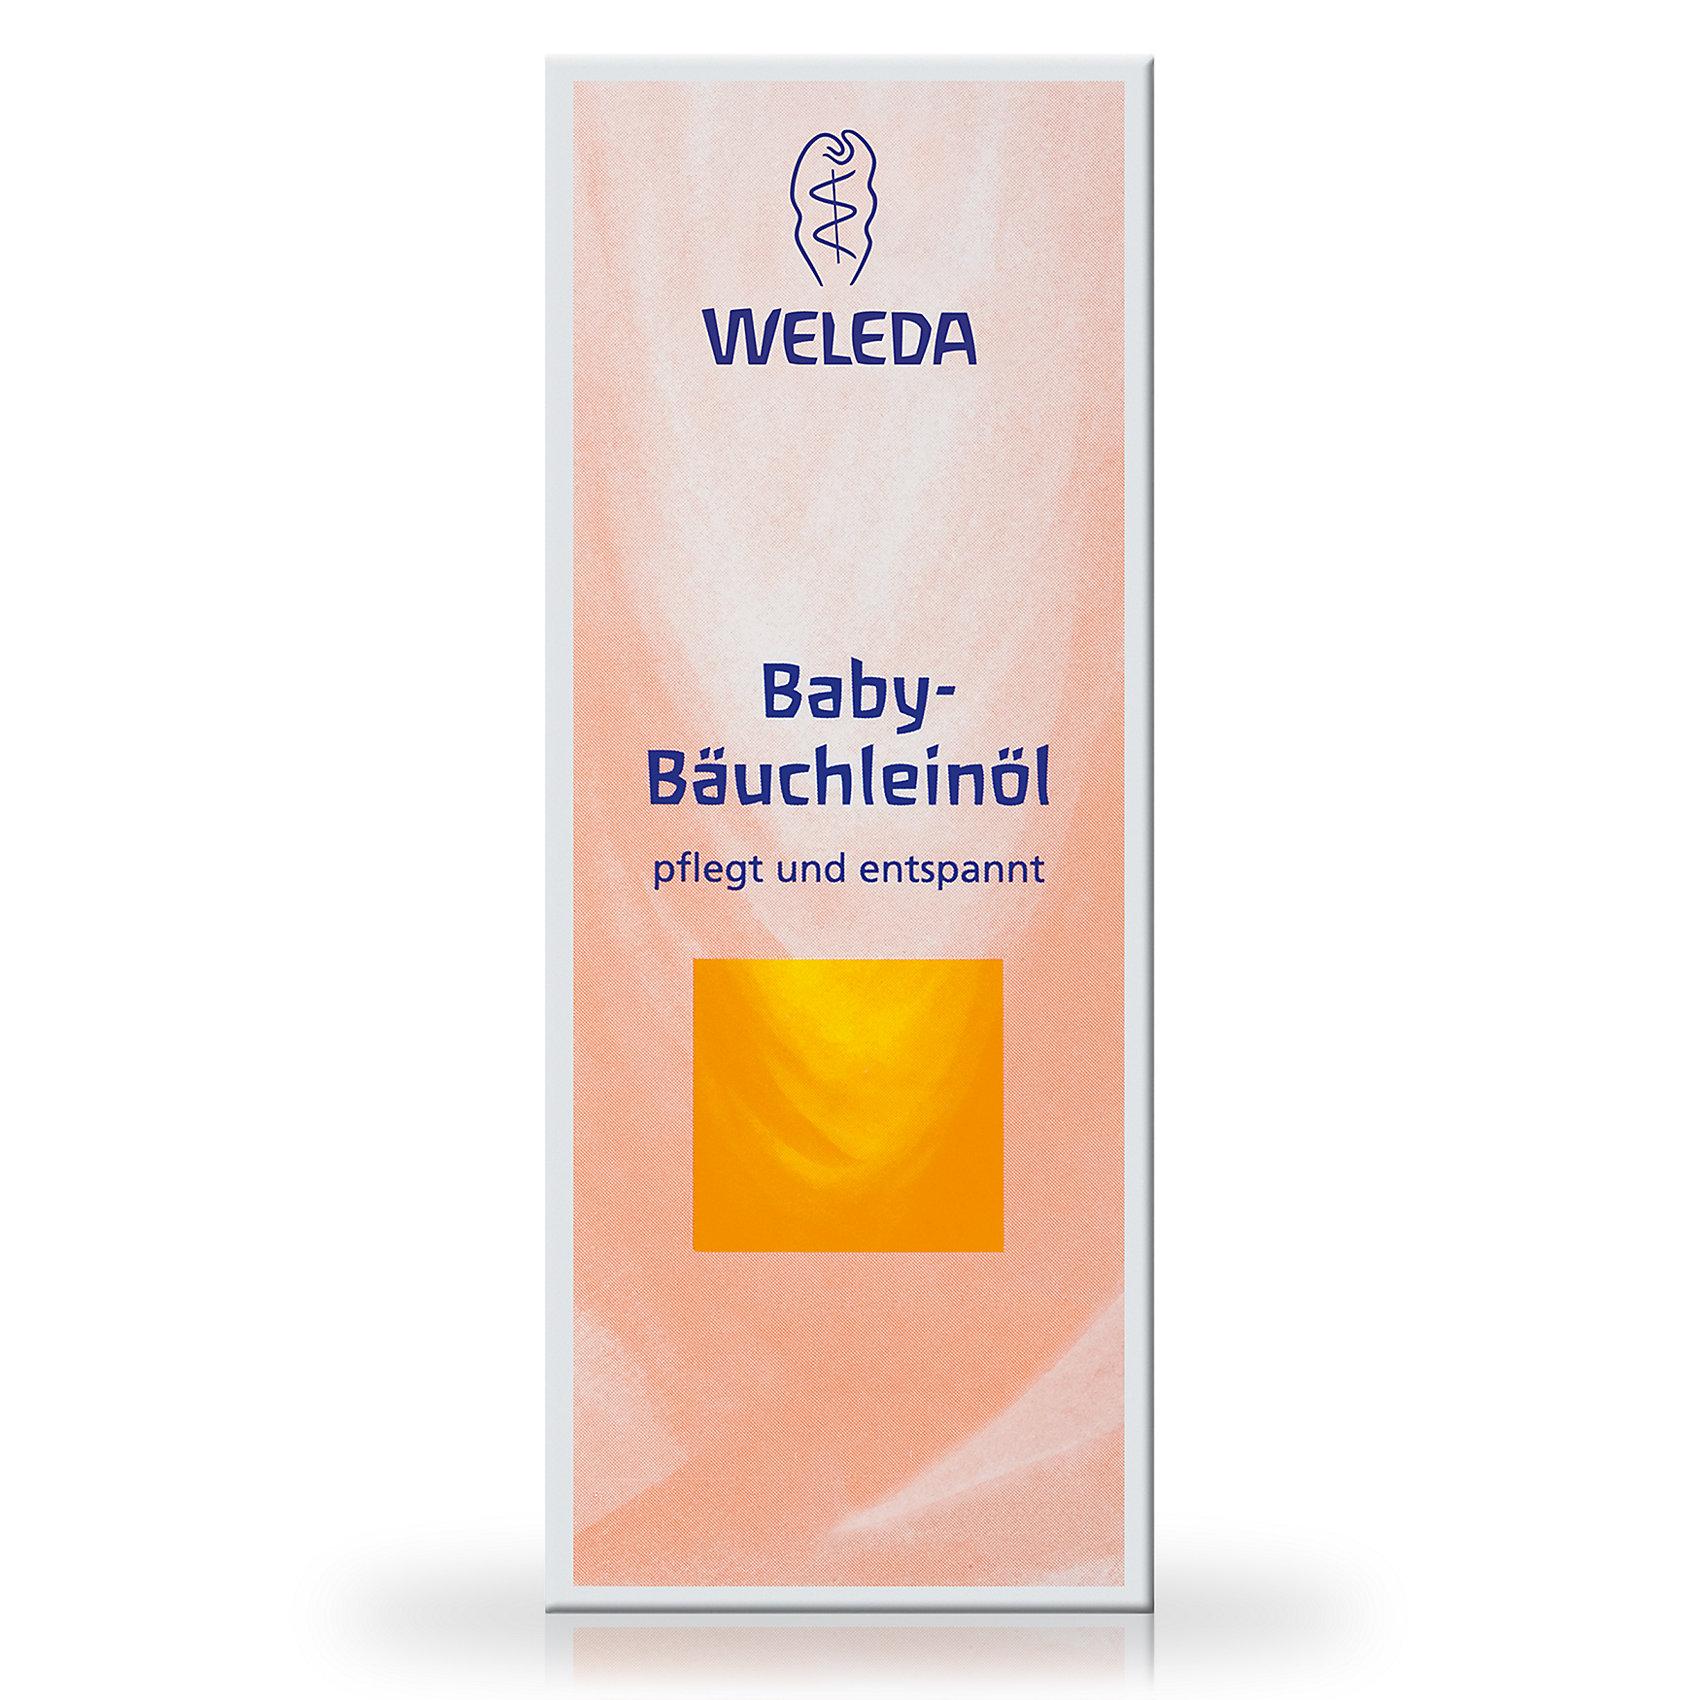 Масло для массажа животиков младенцев, 50 мл., Weleda (-)